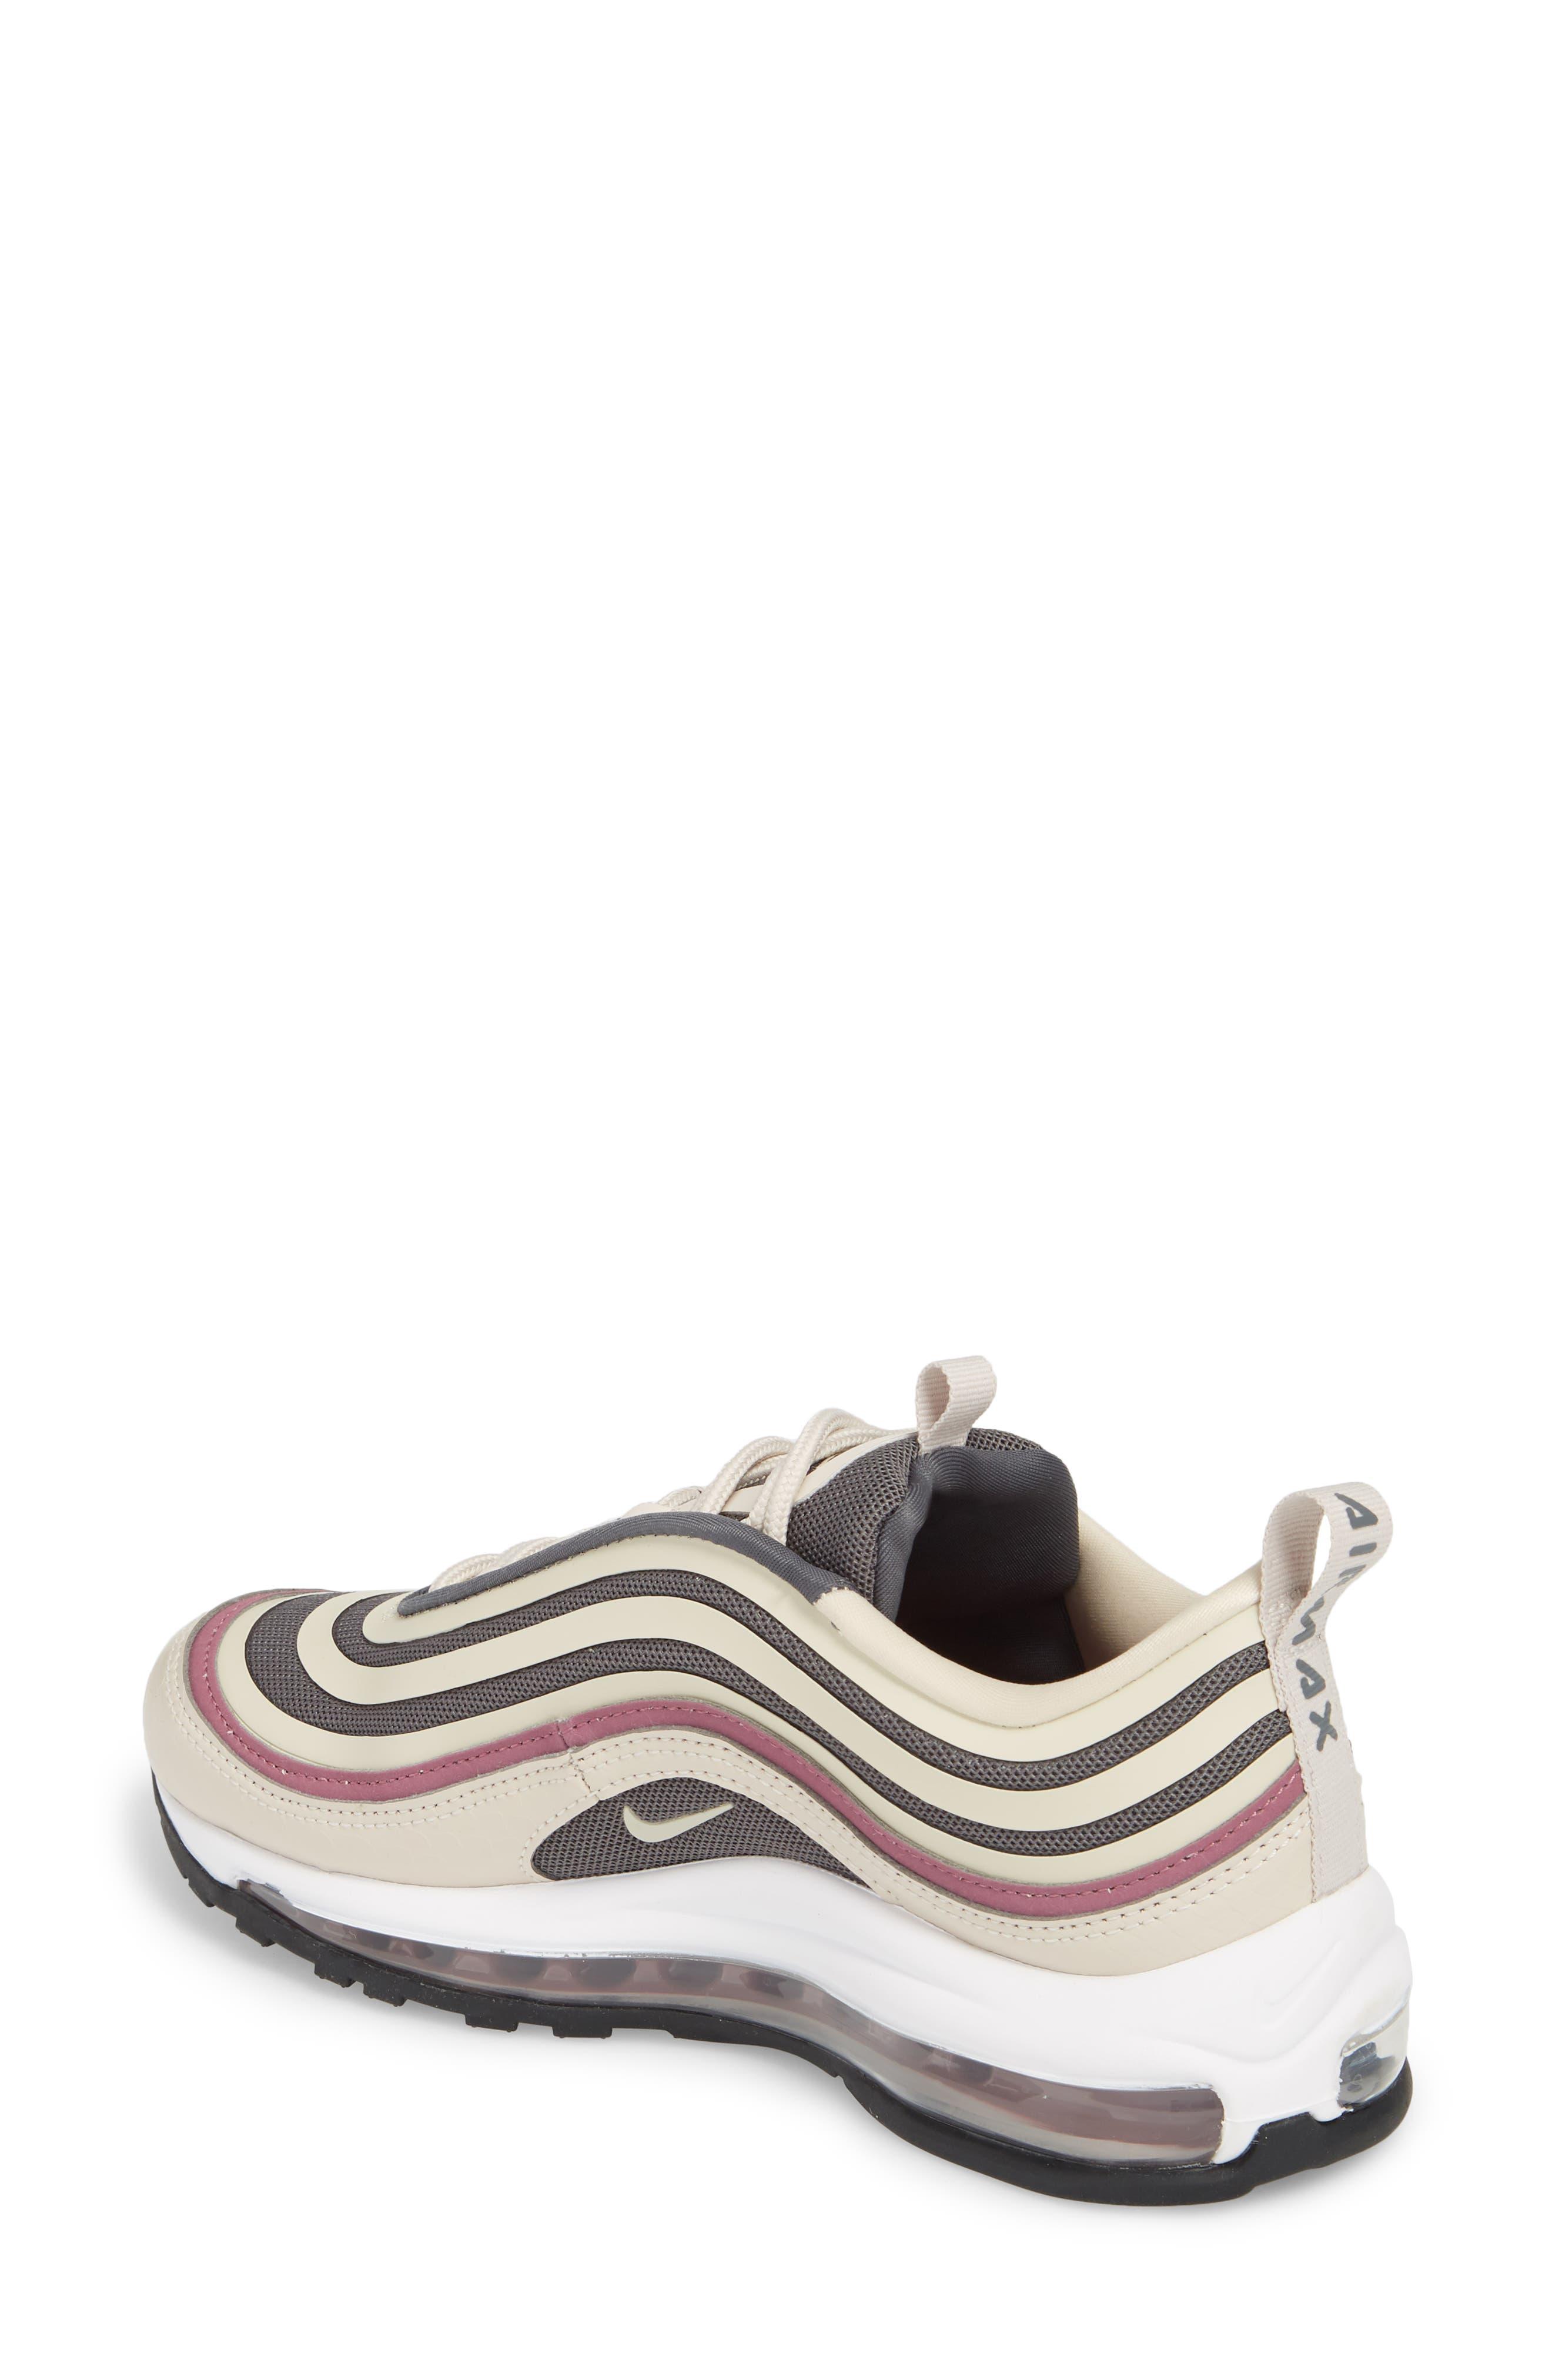 Air Max 97 Ultra '17 SE Sneaker,                             Alternate thumbnail 14, color,